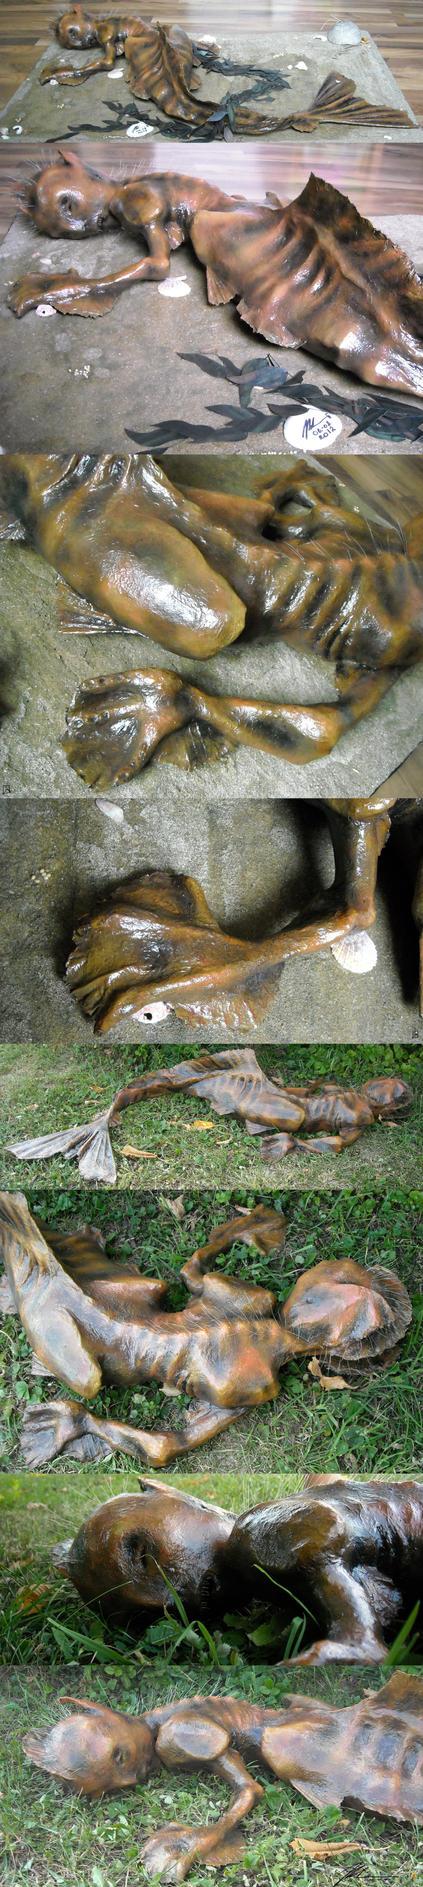 Mermaid Mummy Details by RandomMumble